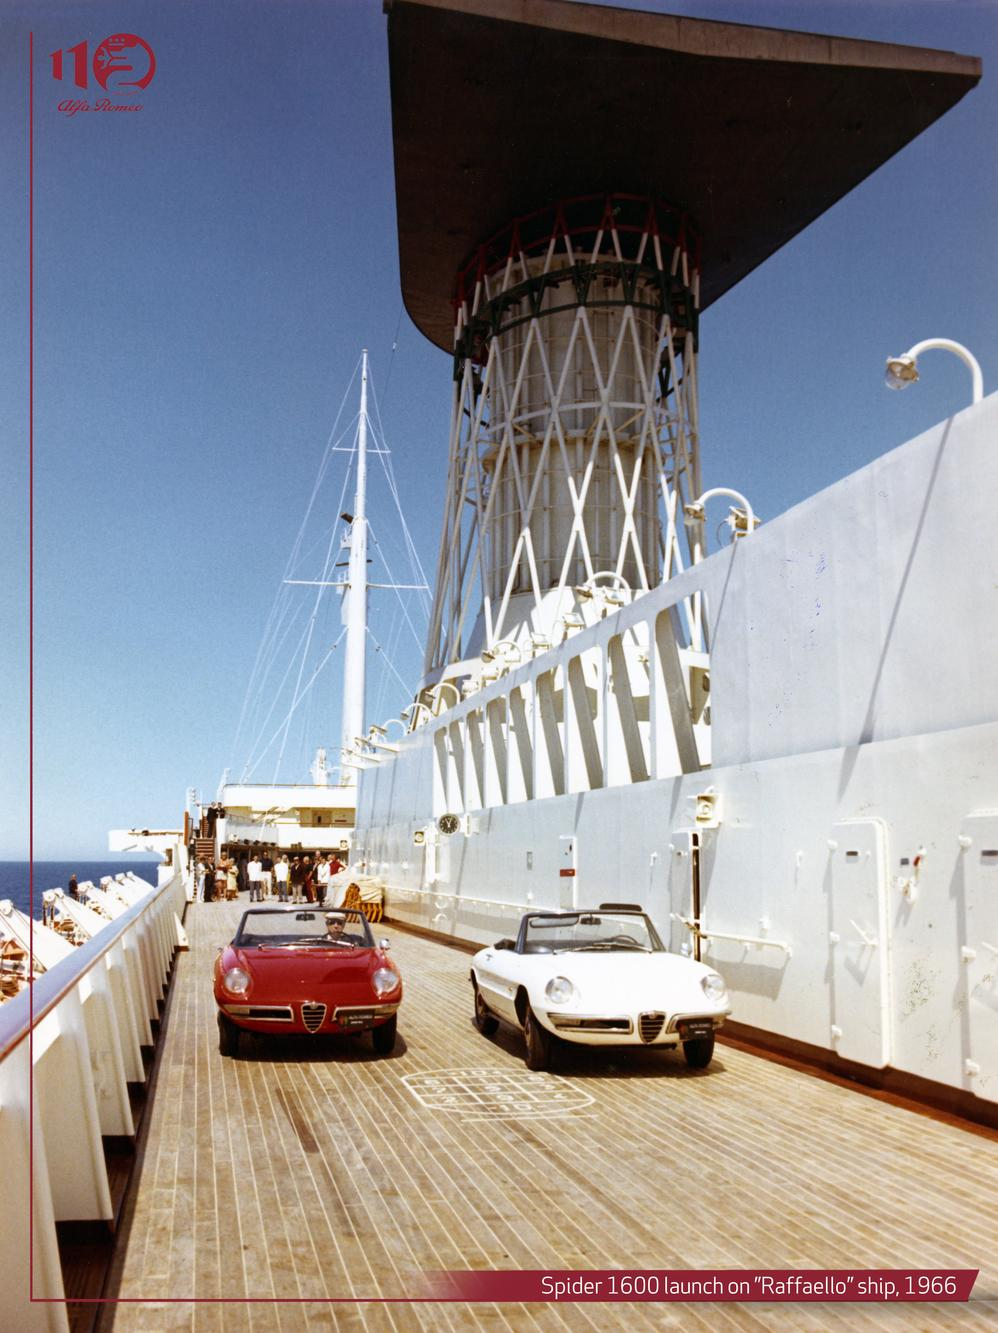 rsz_spider-1600_launch_on_raffaello_ship-1966_eng.jpg